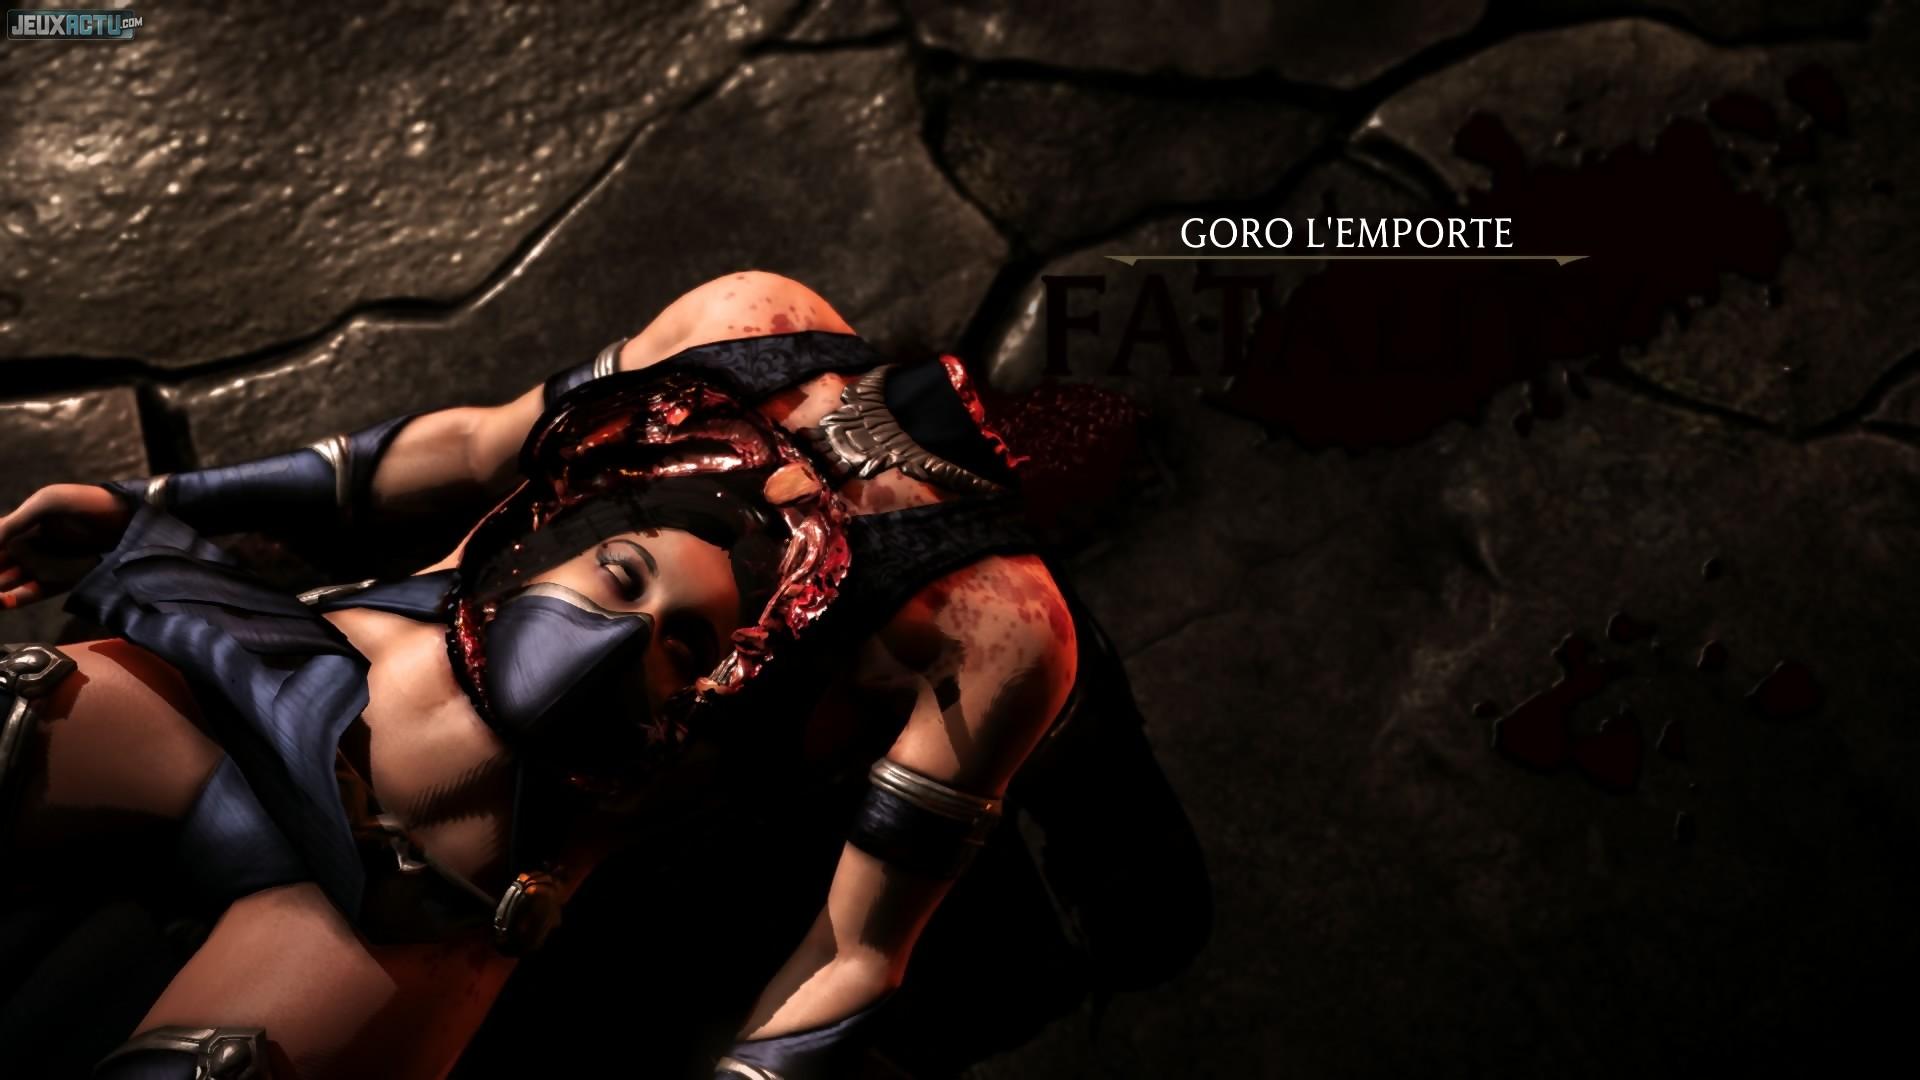 Mortal kombat xxx porn images sex pic